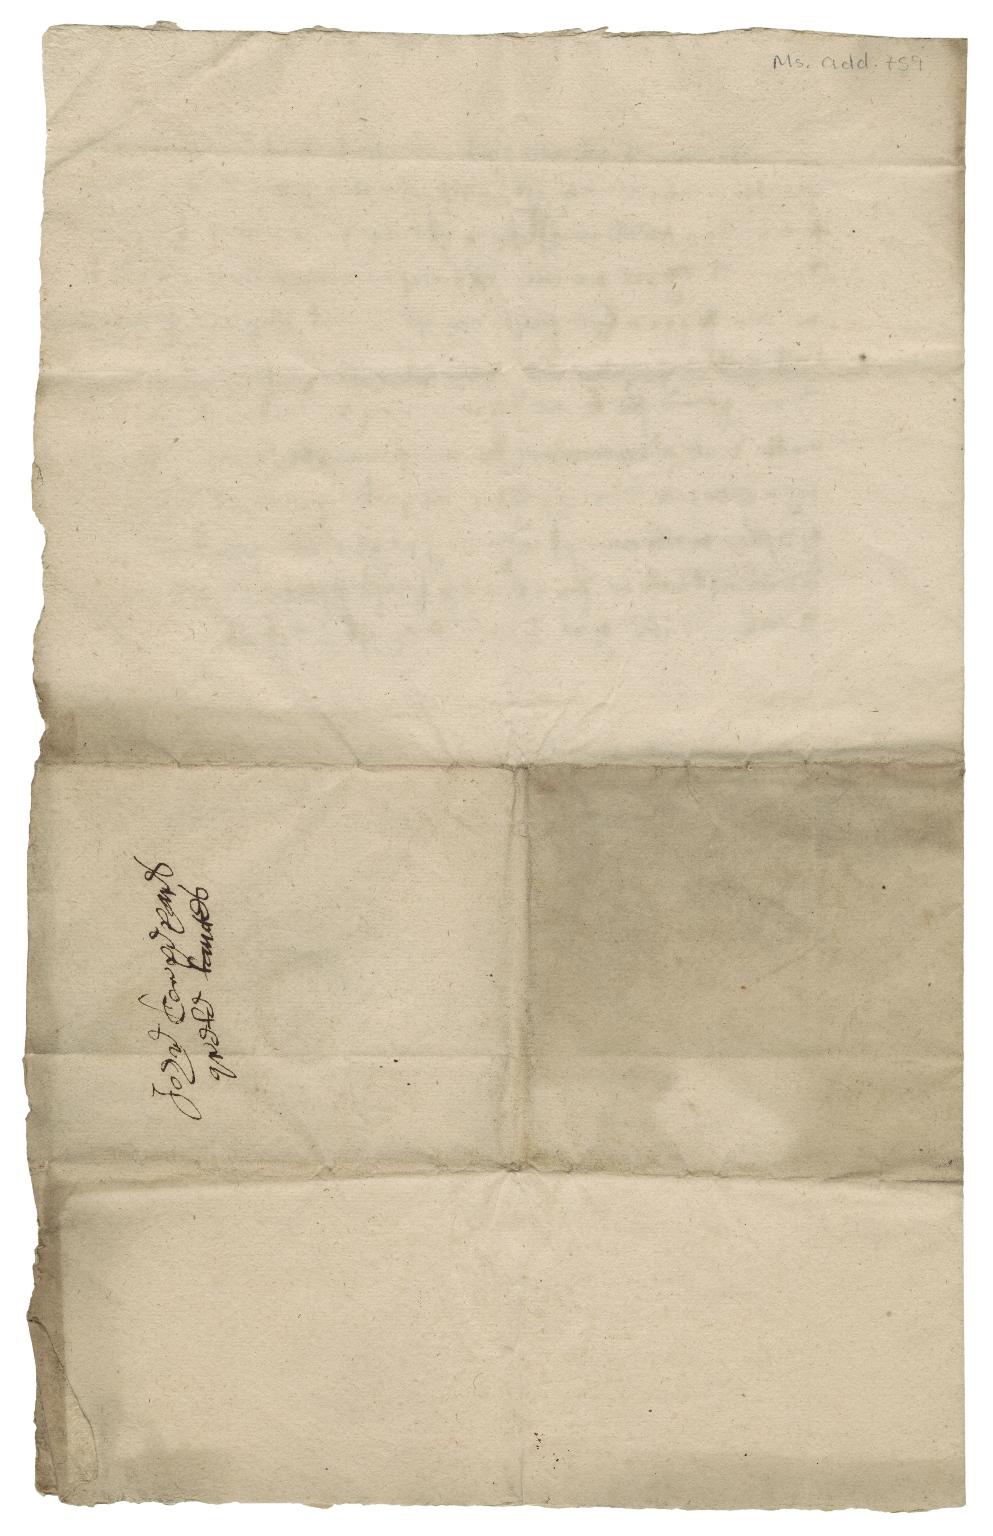 Acquittance from John Cooper, brewer of Hitchin, Hertfordshire to William Fletcher, brewer of Hitchin, Hertfordshire